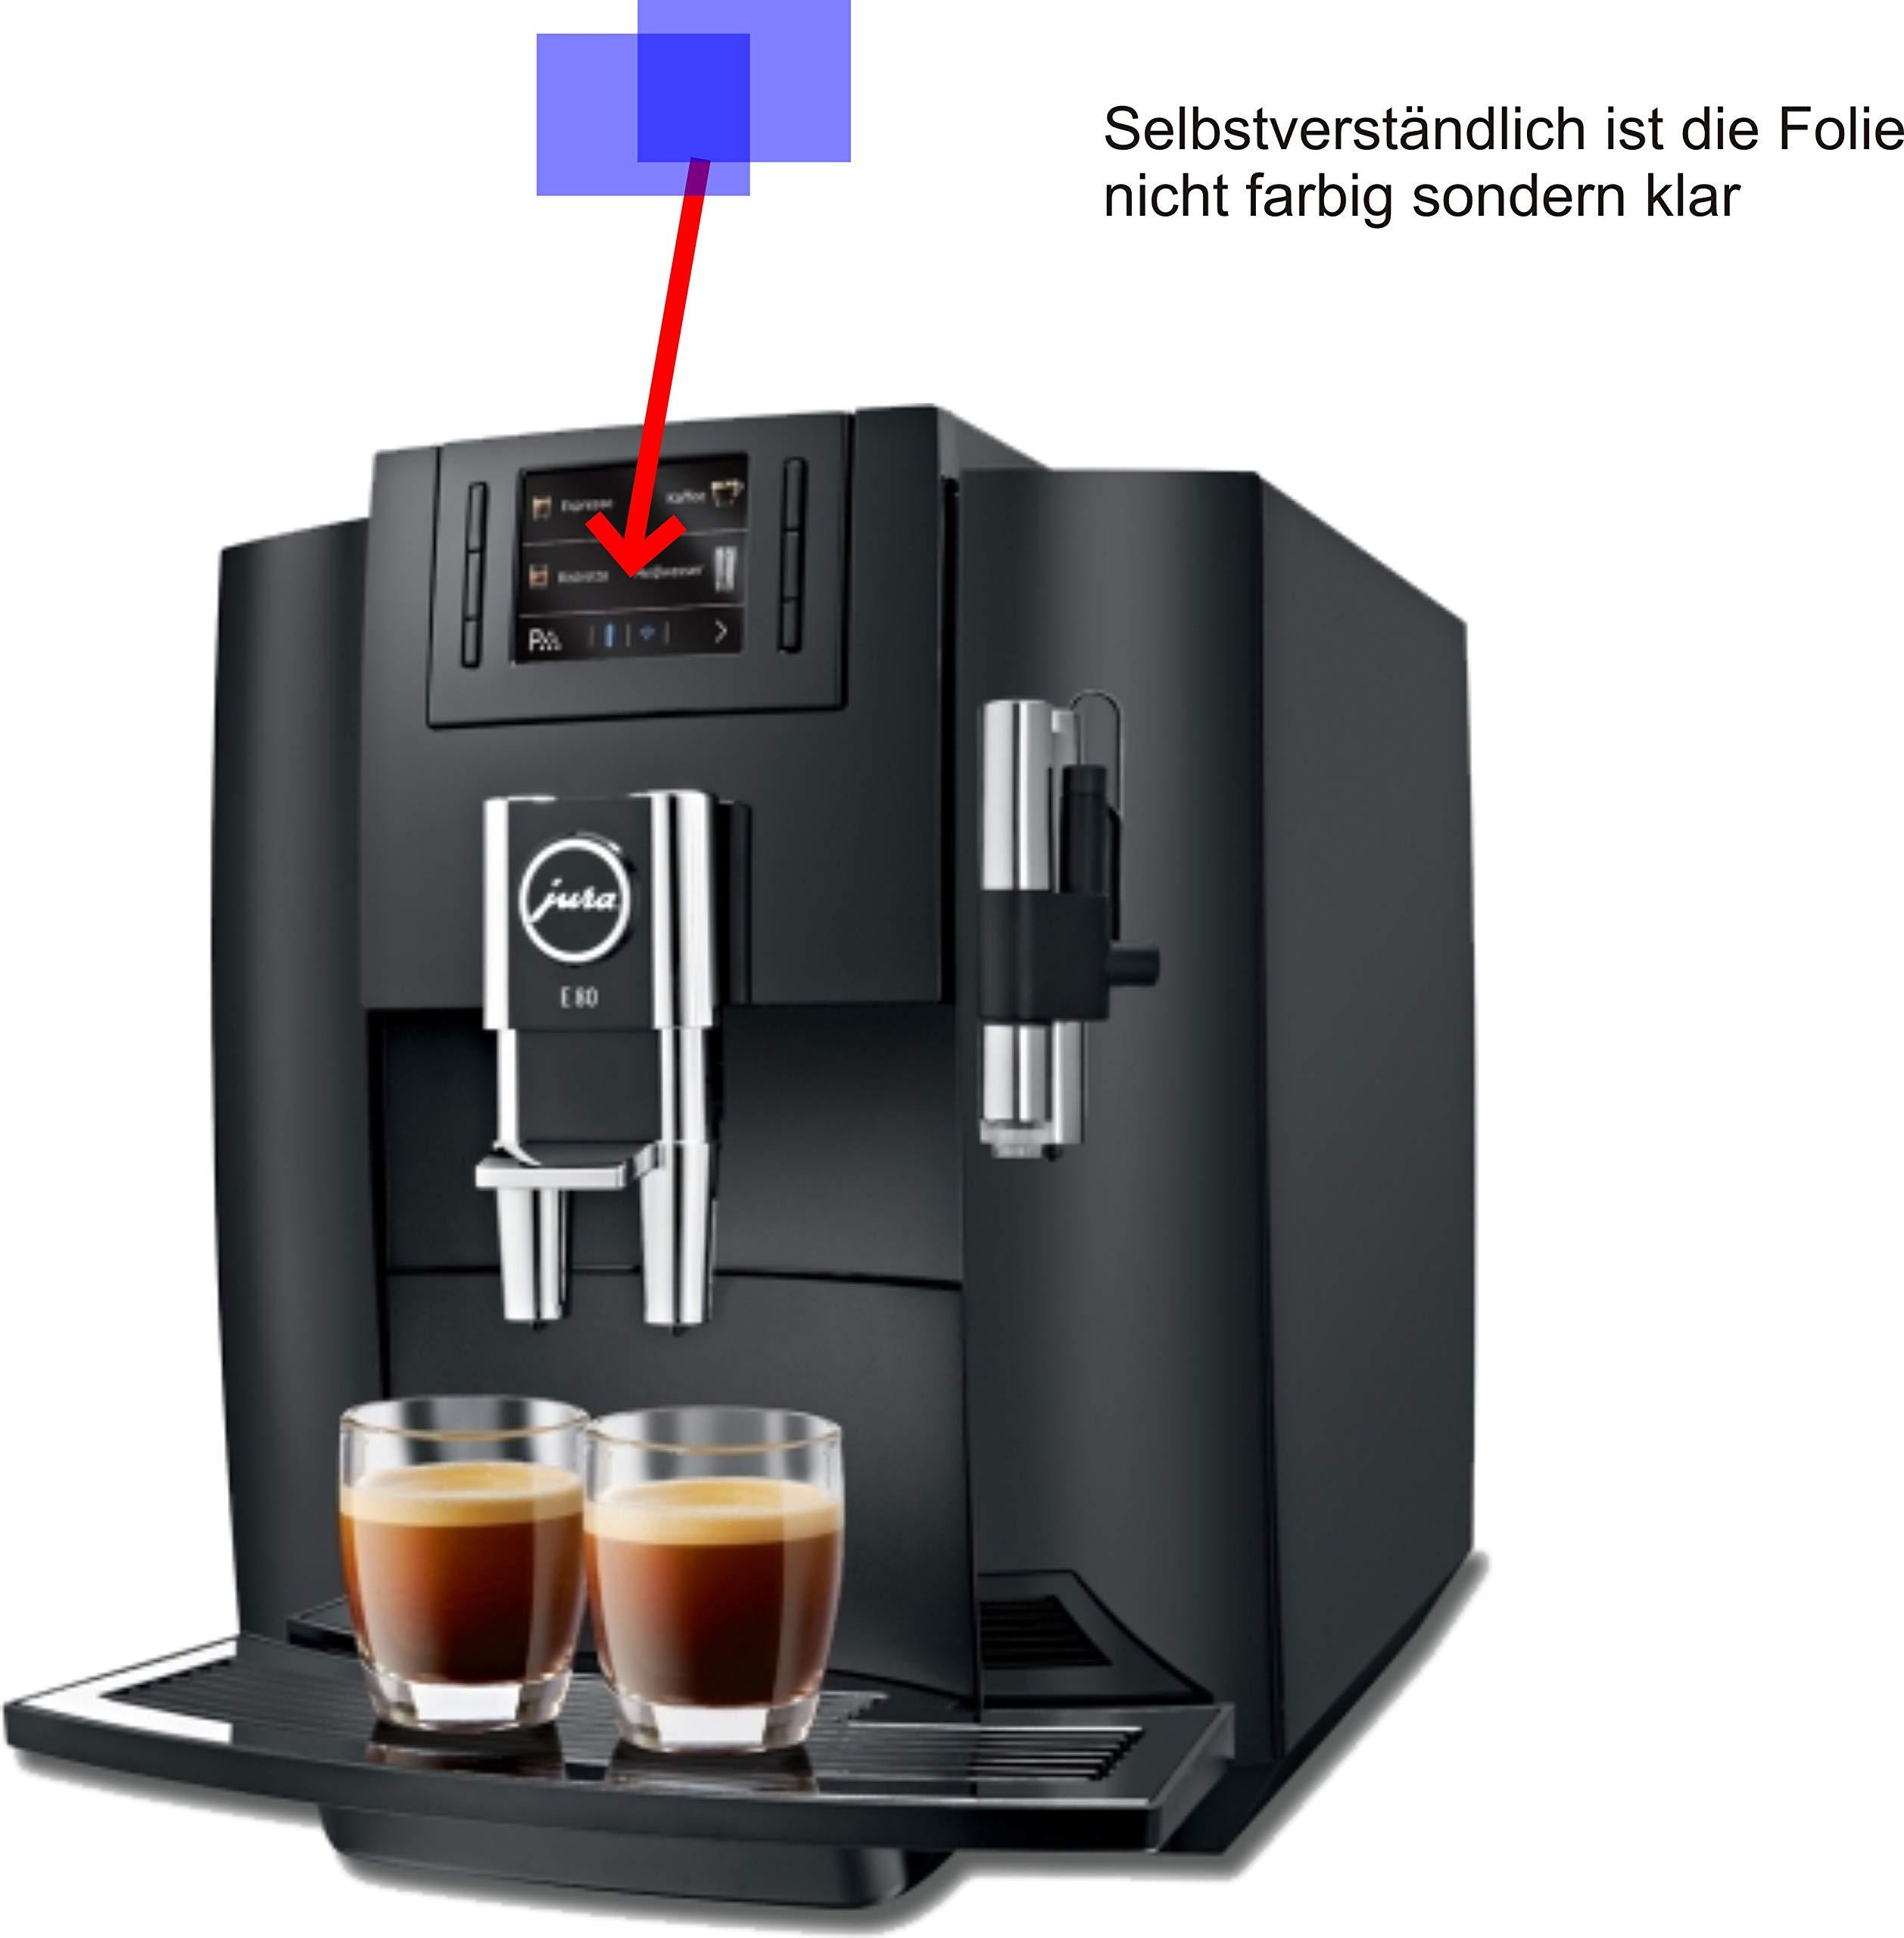 2X-ANTIREFLEX-matt-Schutzfolie-fr-Jura-E80-Piano-Black-15083-Kaffeevollautomat-Displayschutzfolie-Bildschirmschutzfolie-Schutzhlle-Displayschutz-Displayfolie-Folie